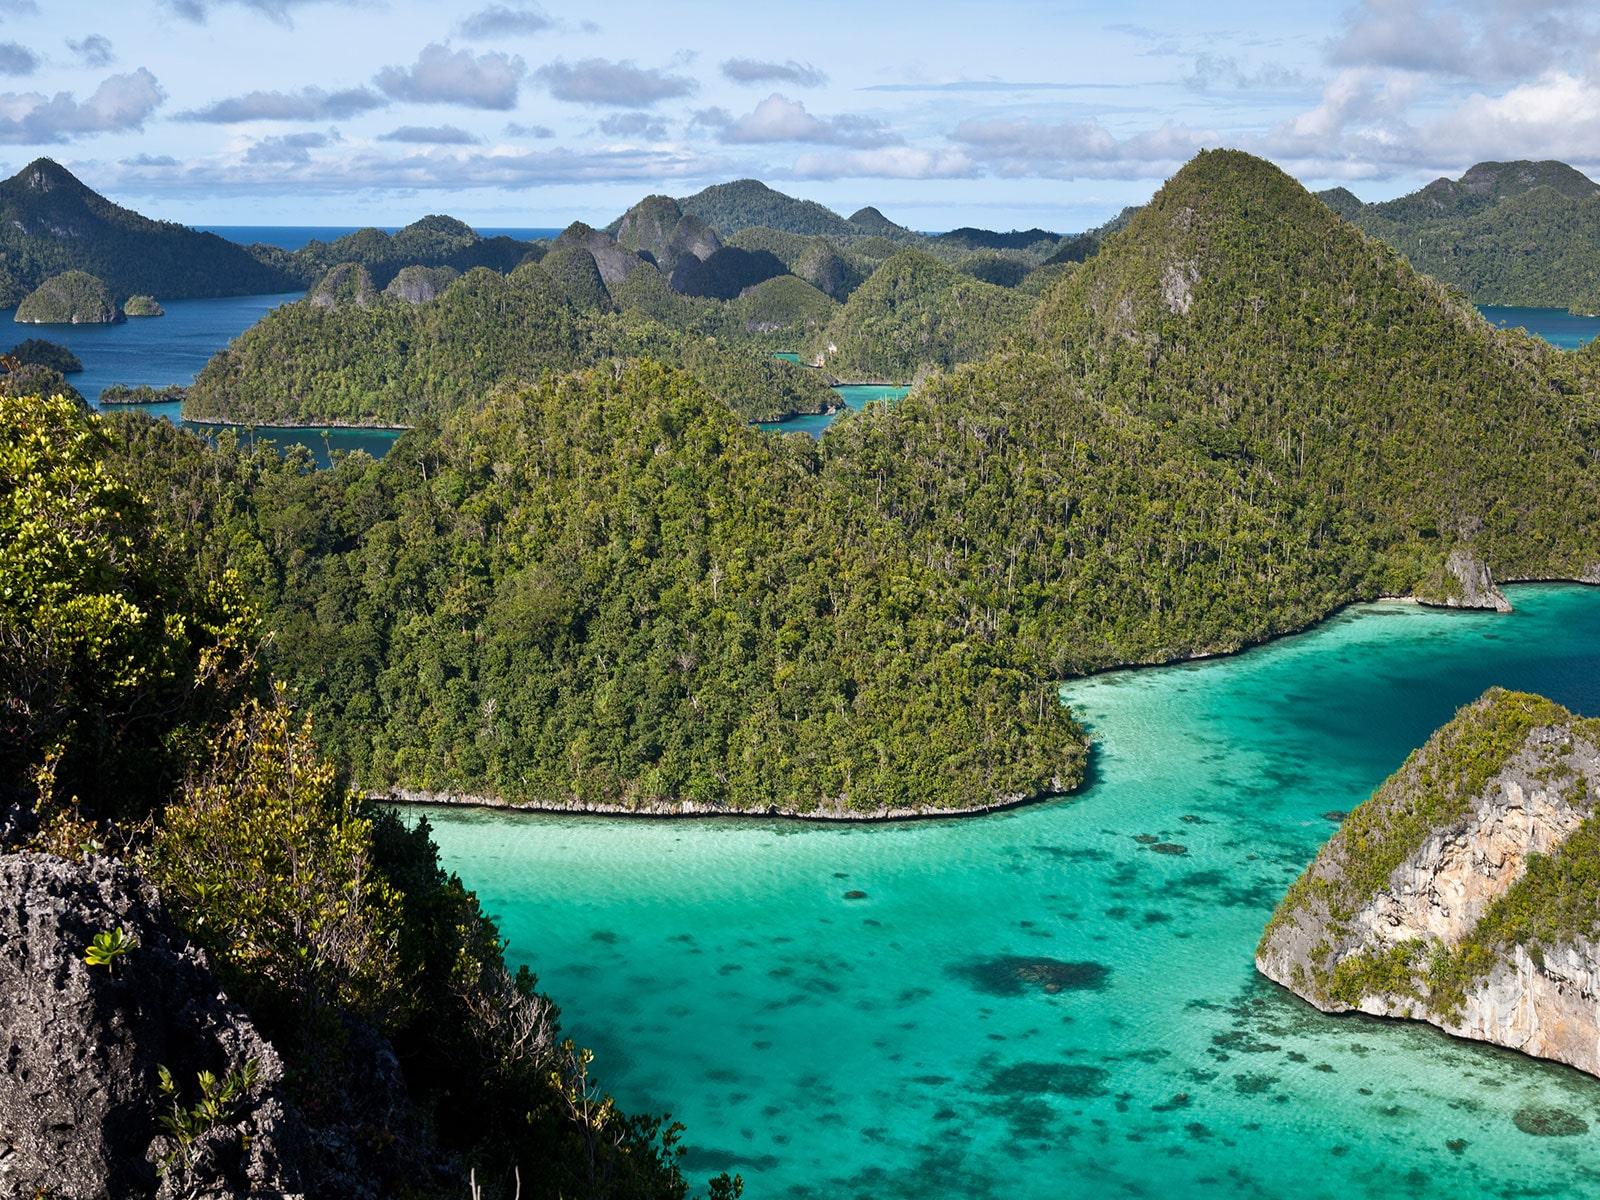 rondreis papua raja ampat hoogtepunt 20